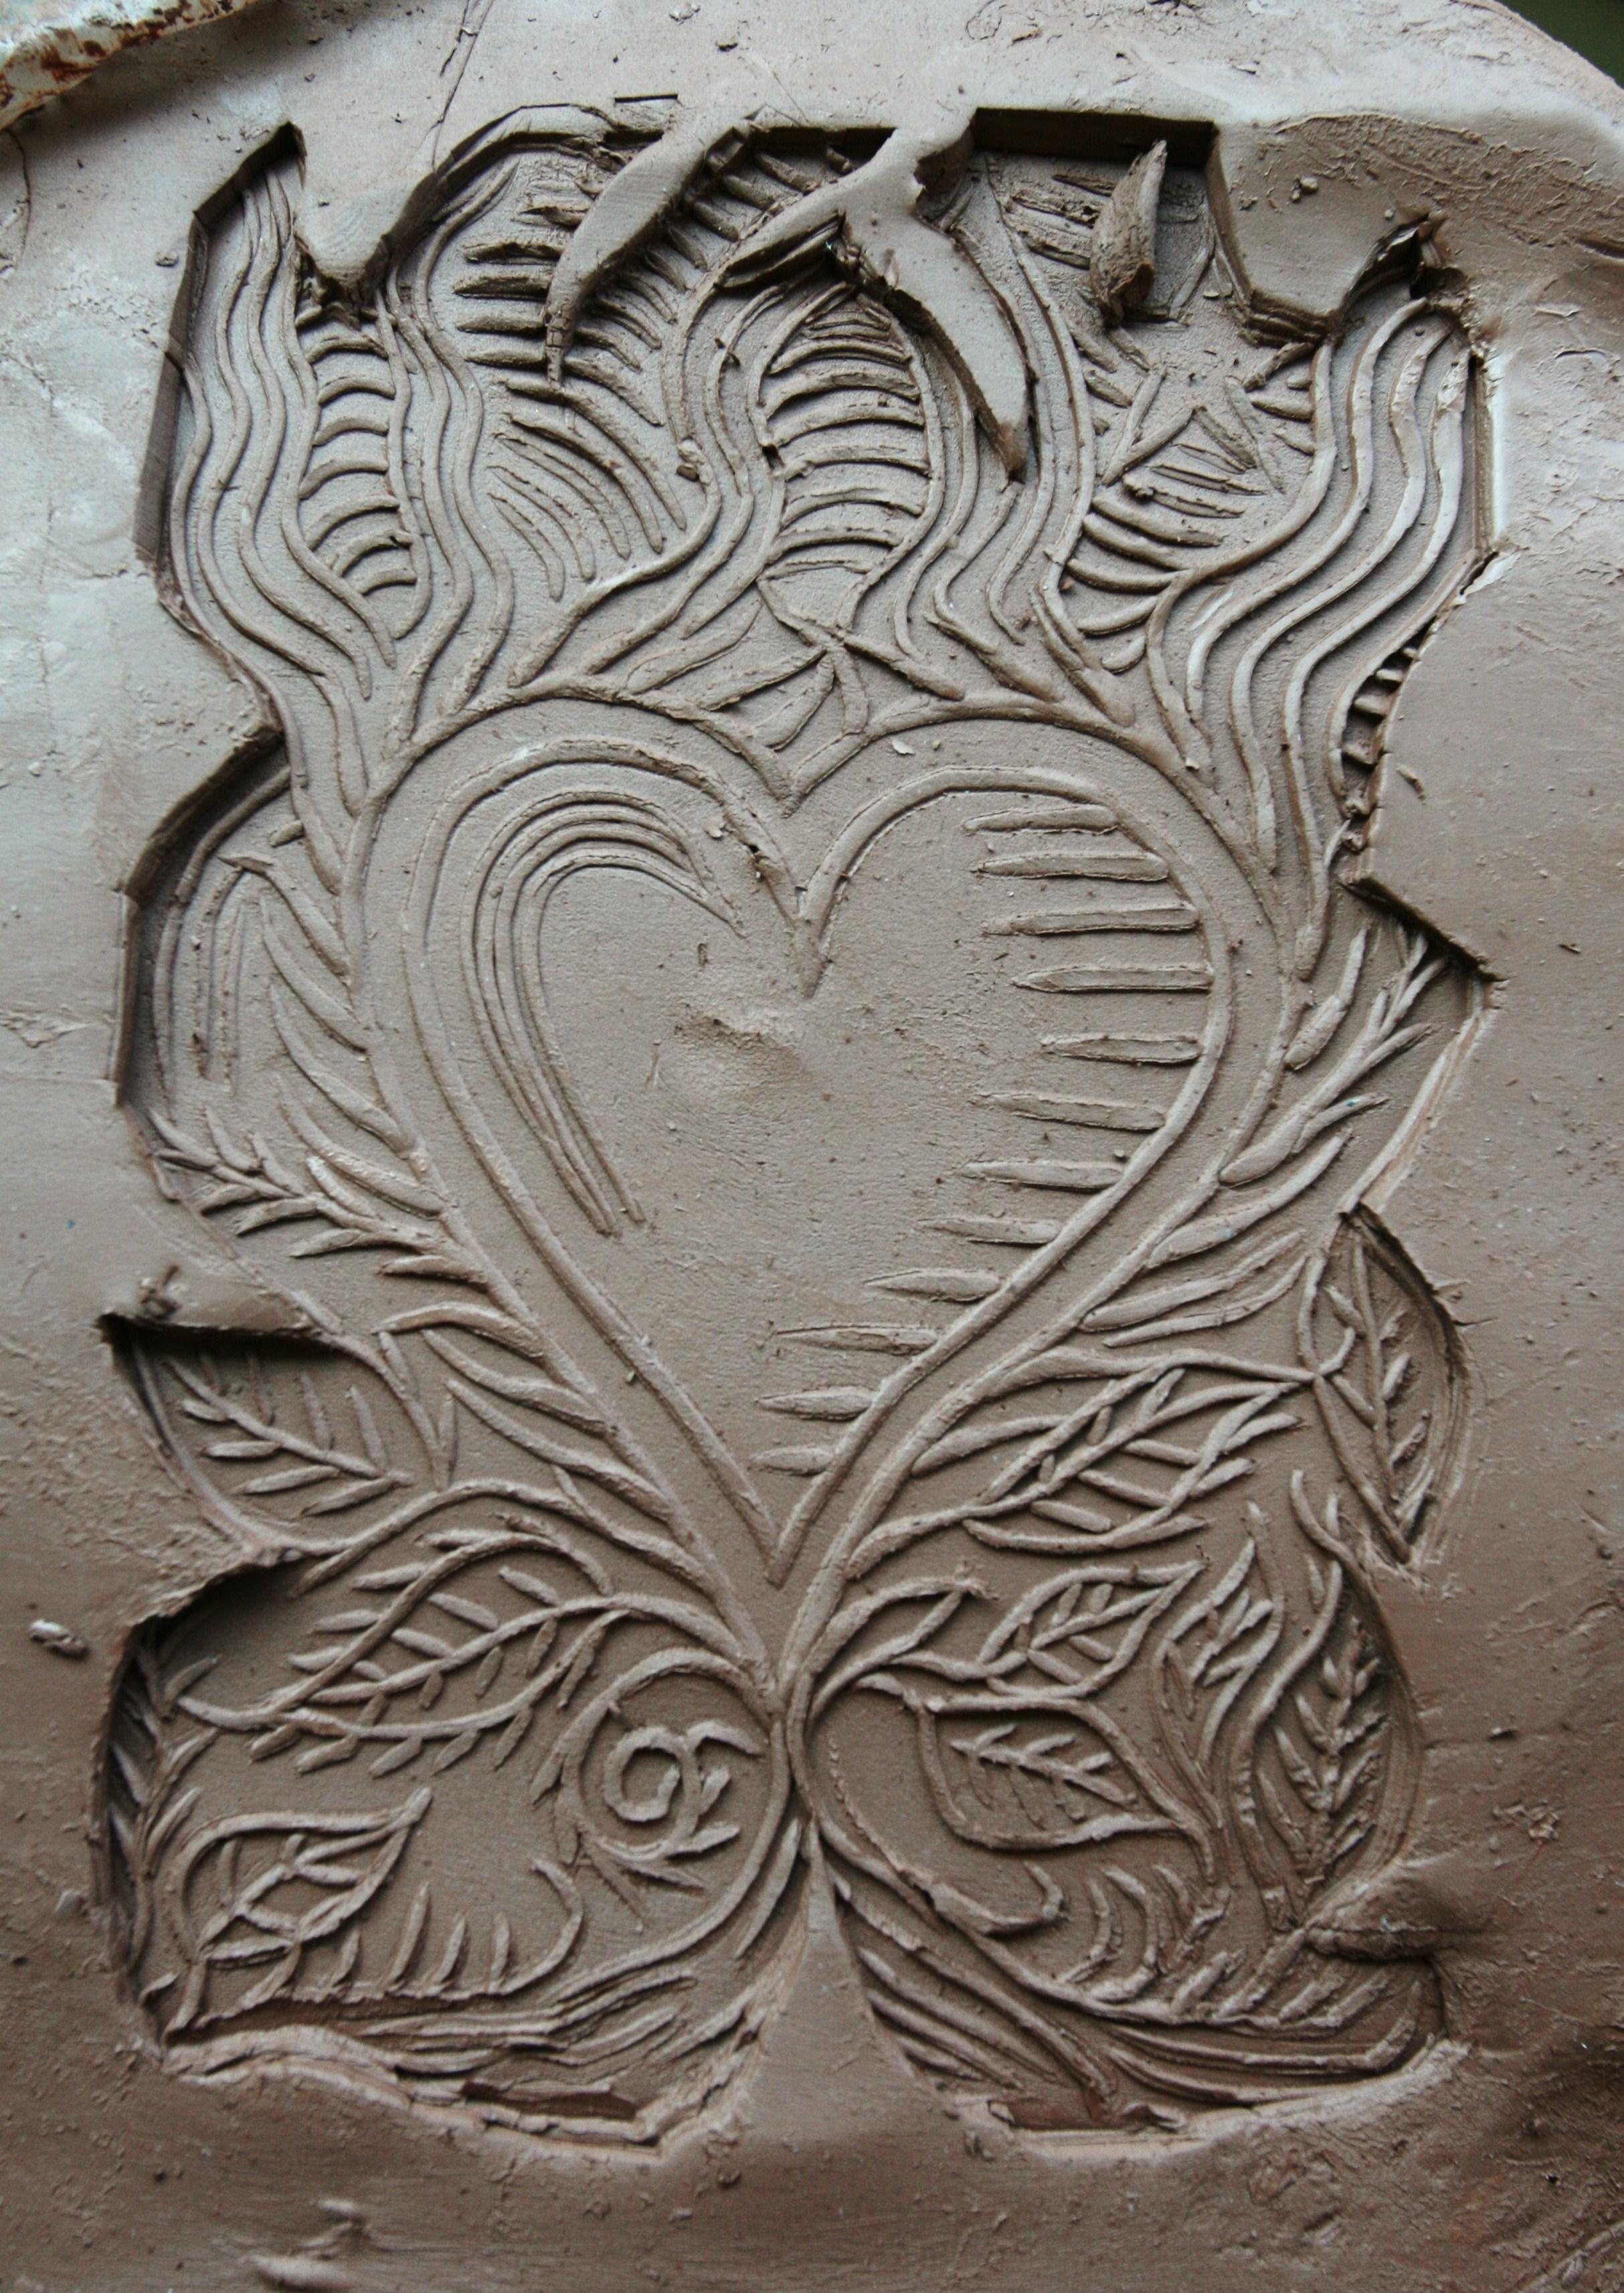 Incorporating Block Printing Into Concrete Michael Eddy